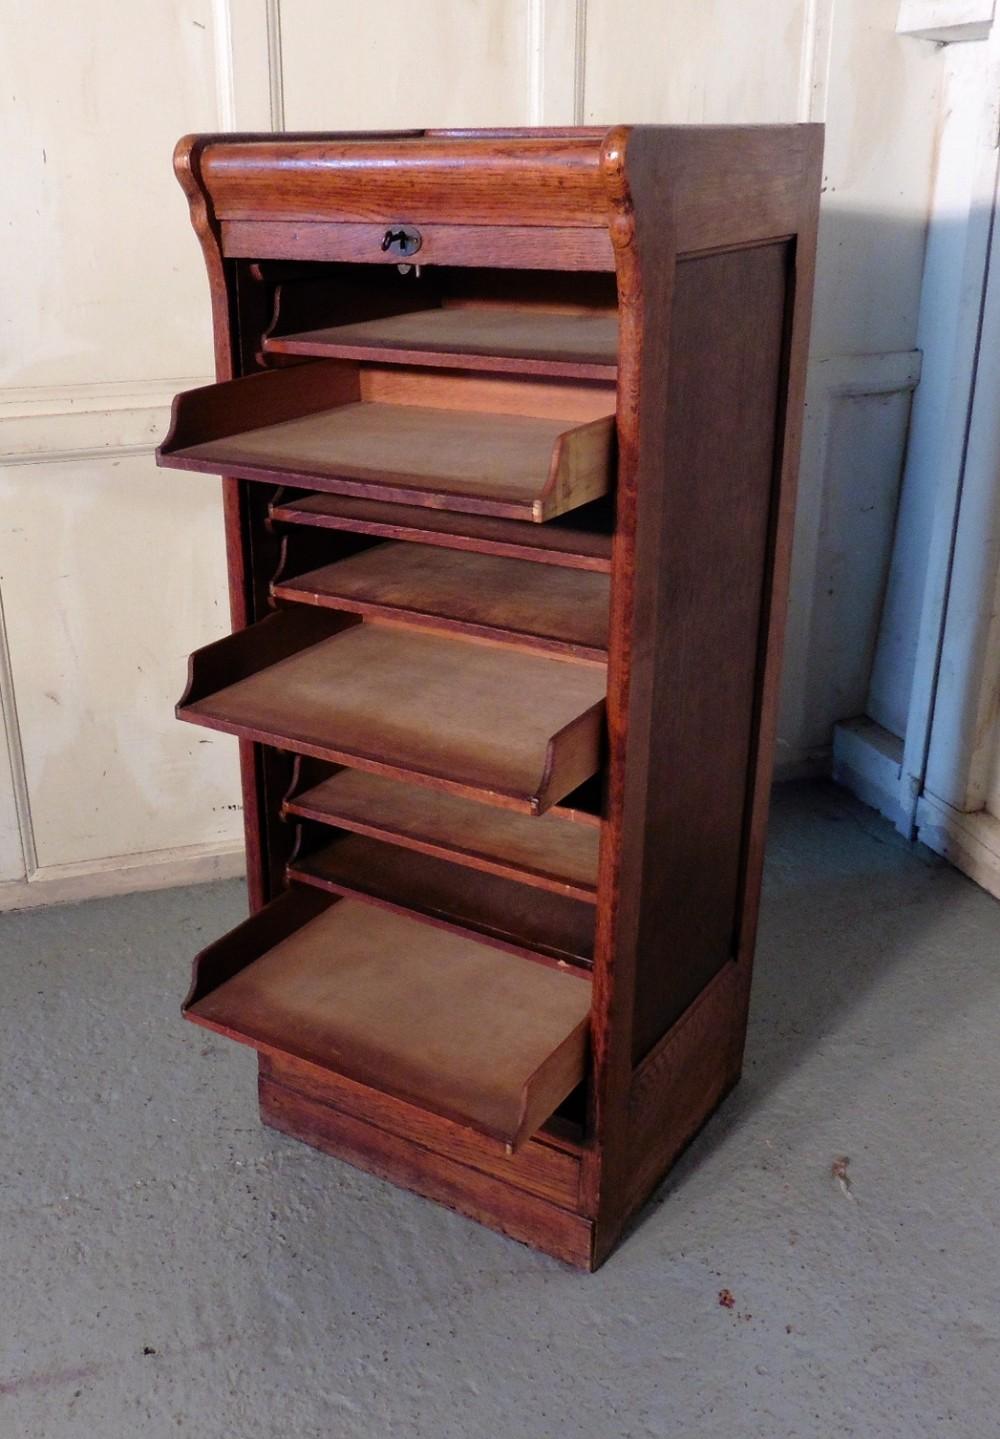 tambour fronted oak art deco filing cabinet with slide shelves